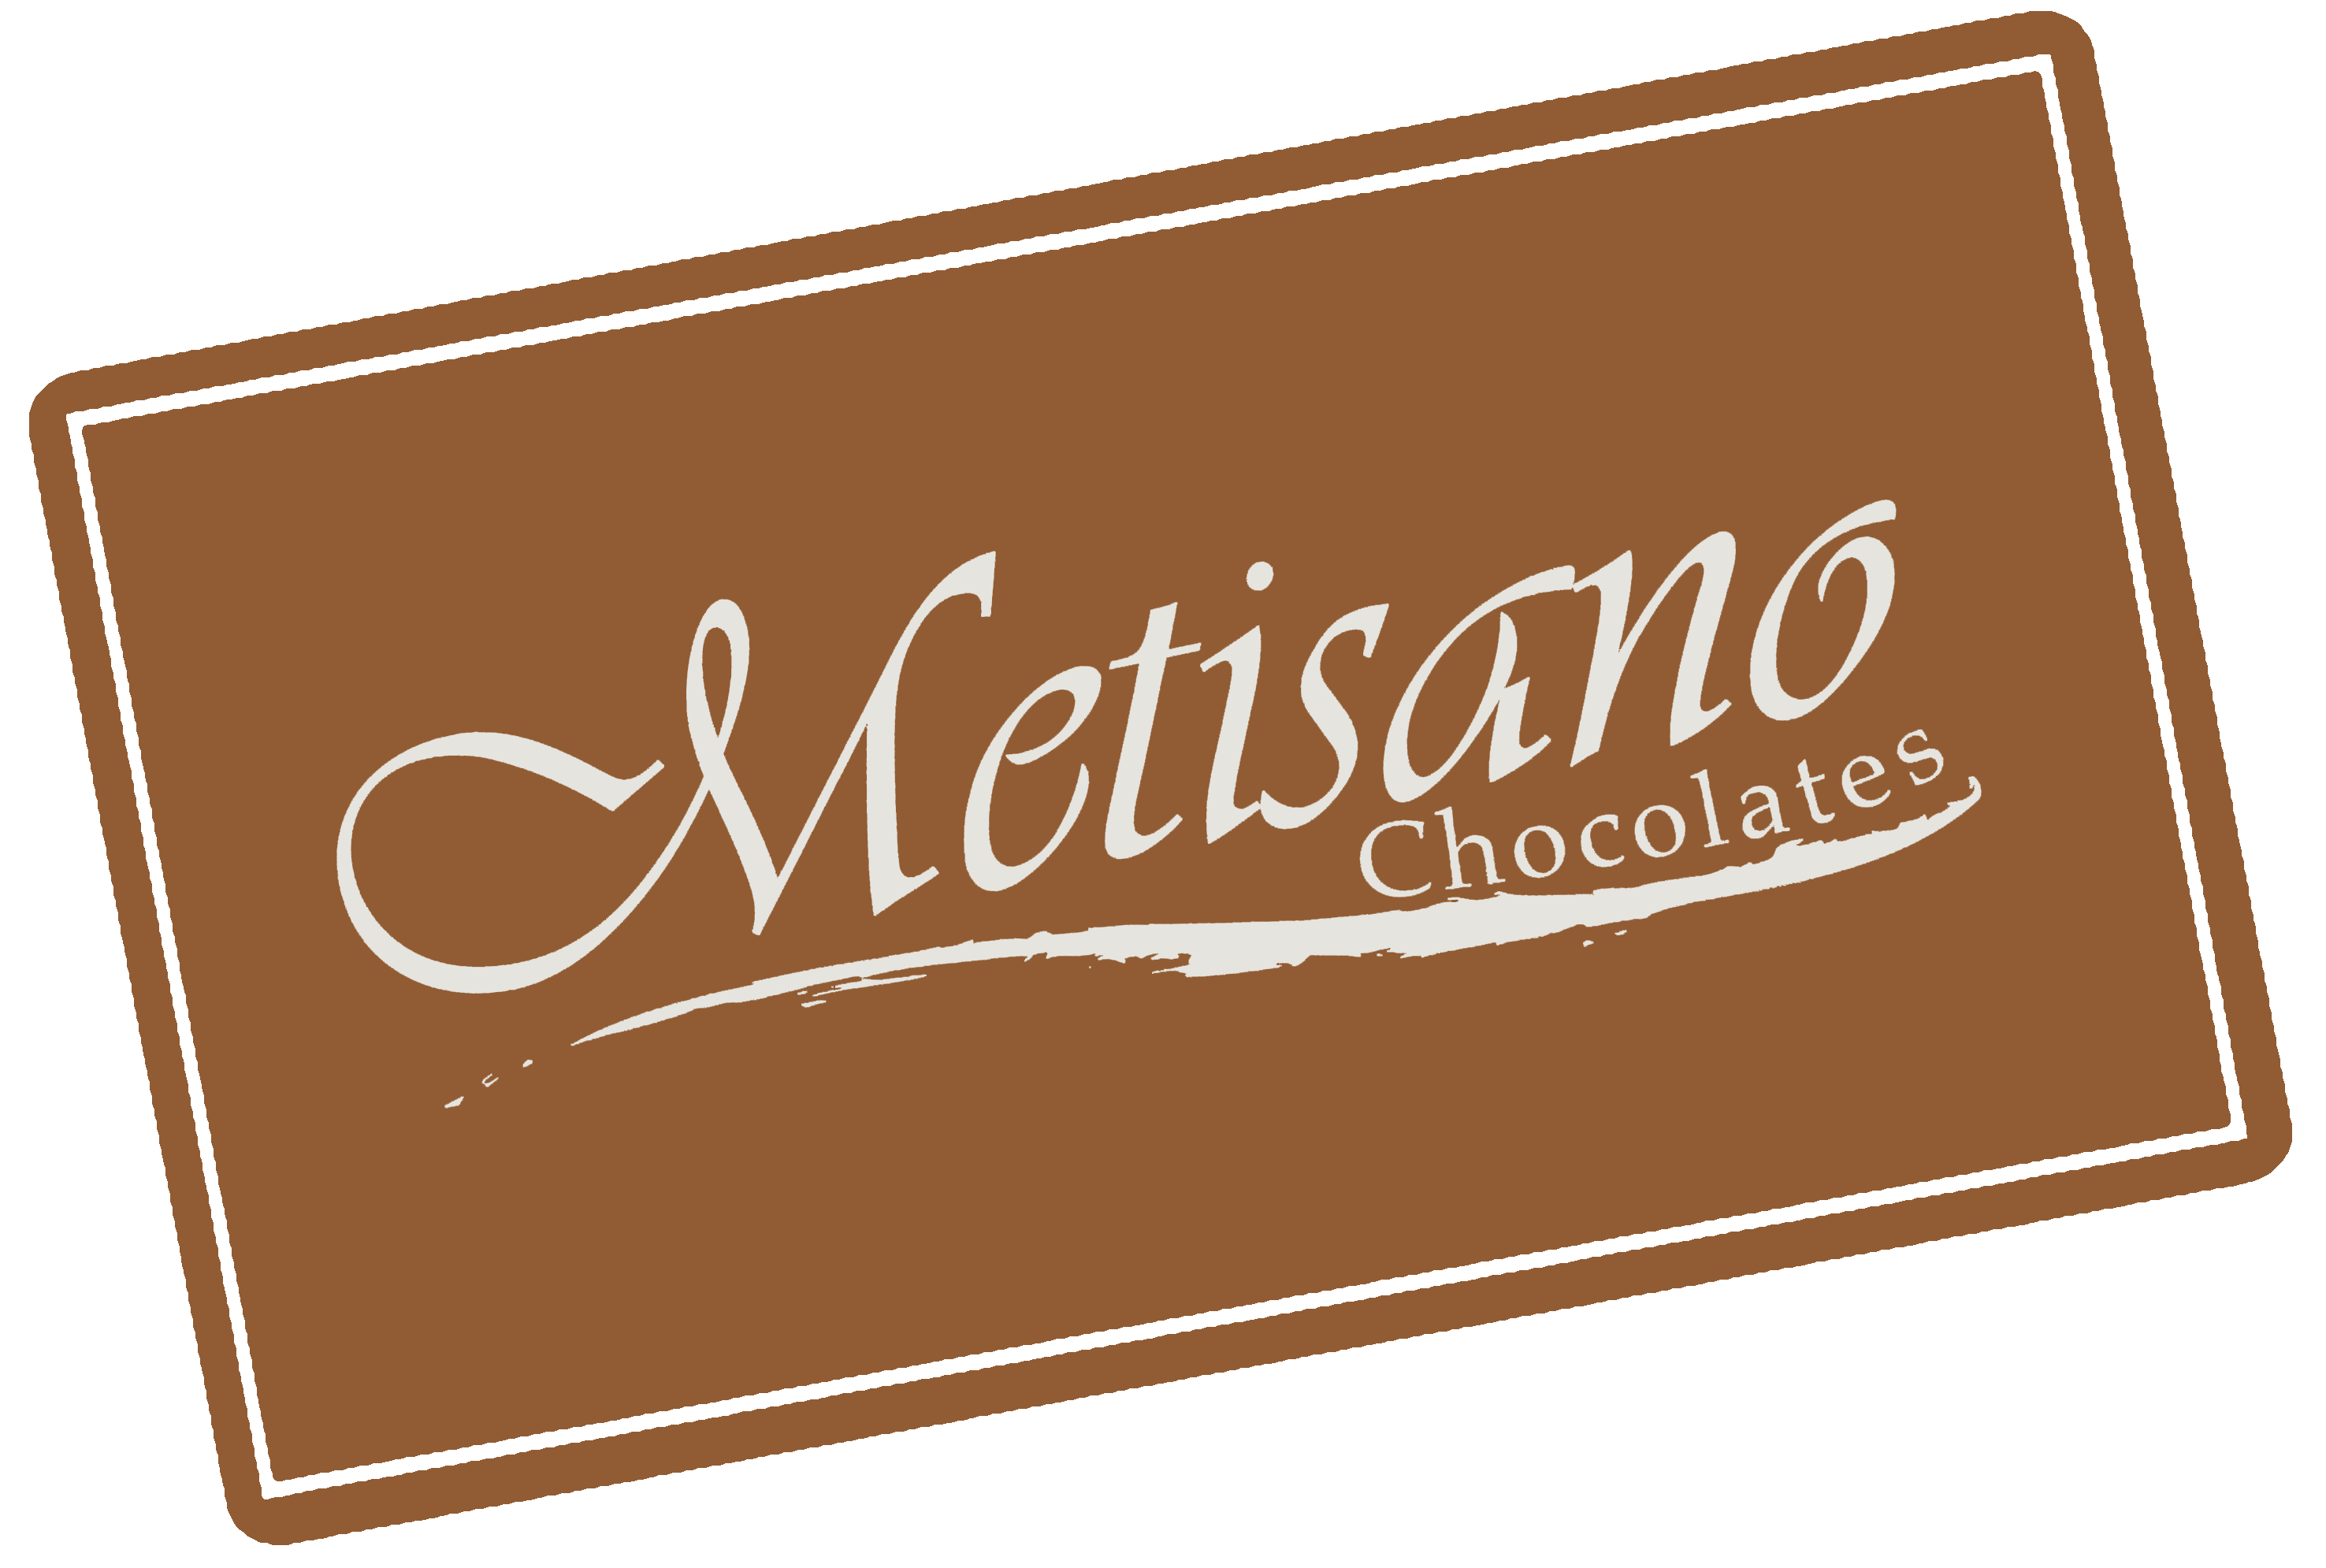 Metisano-logo-NEW_300719